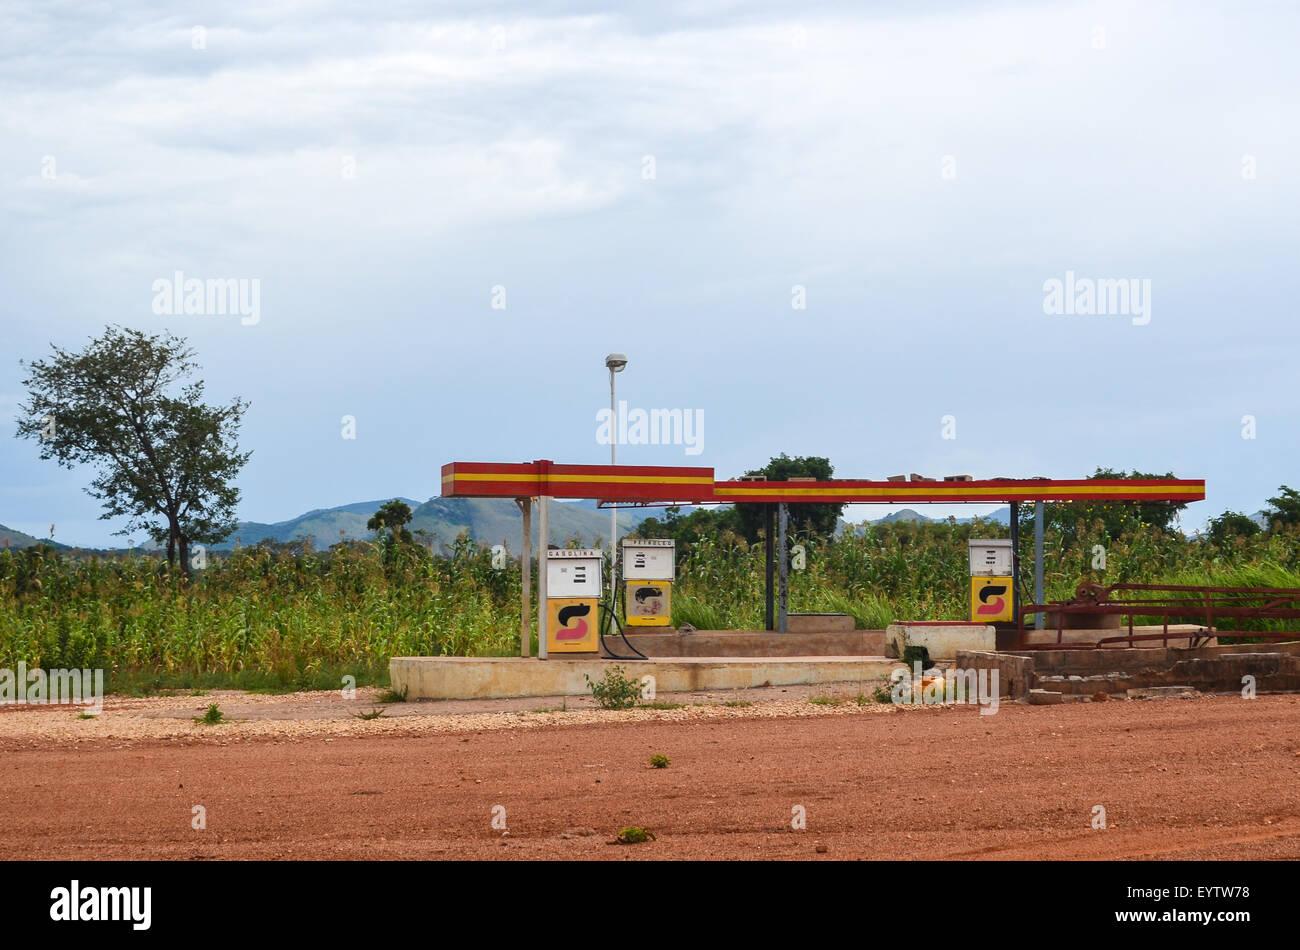 Ruins of a Sonangol petrol station in rural Angola, Benguela province - Stock Image